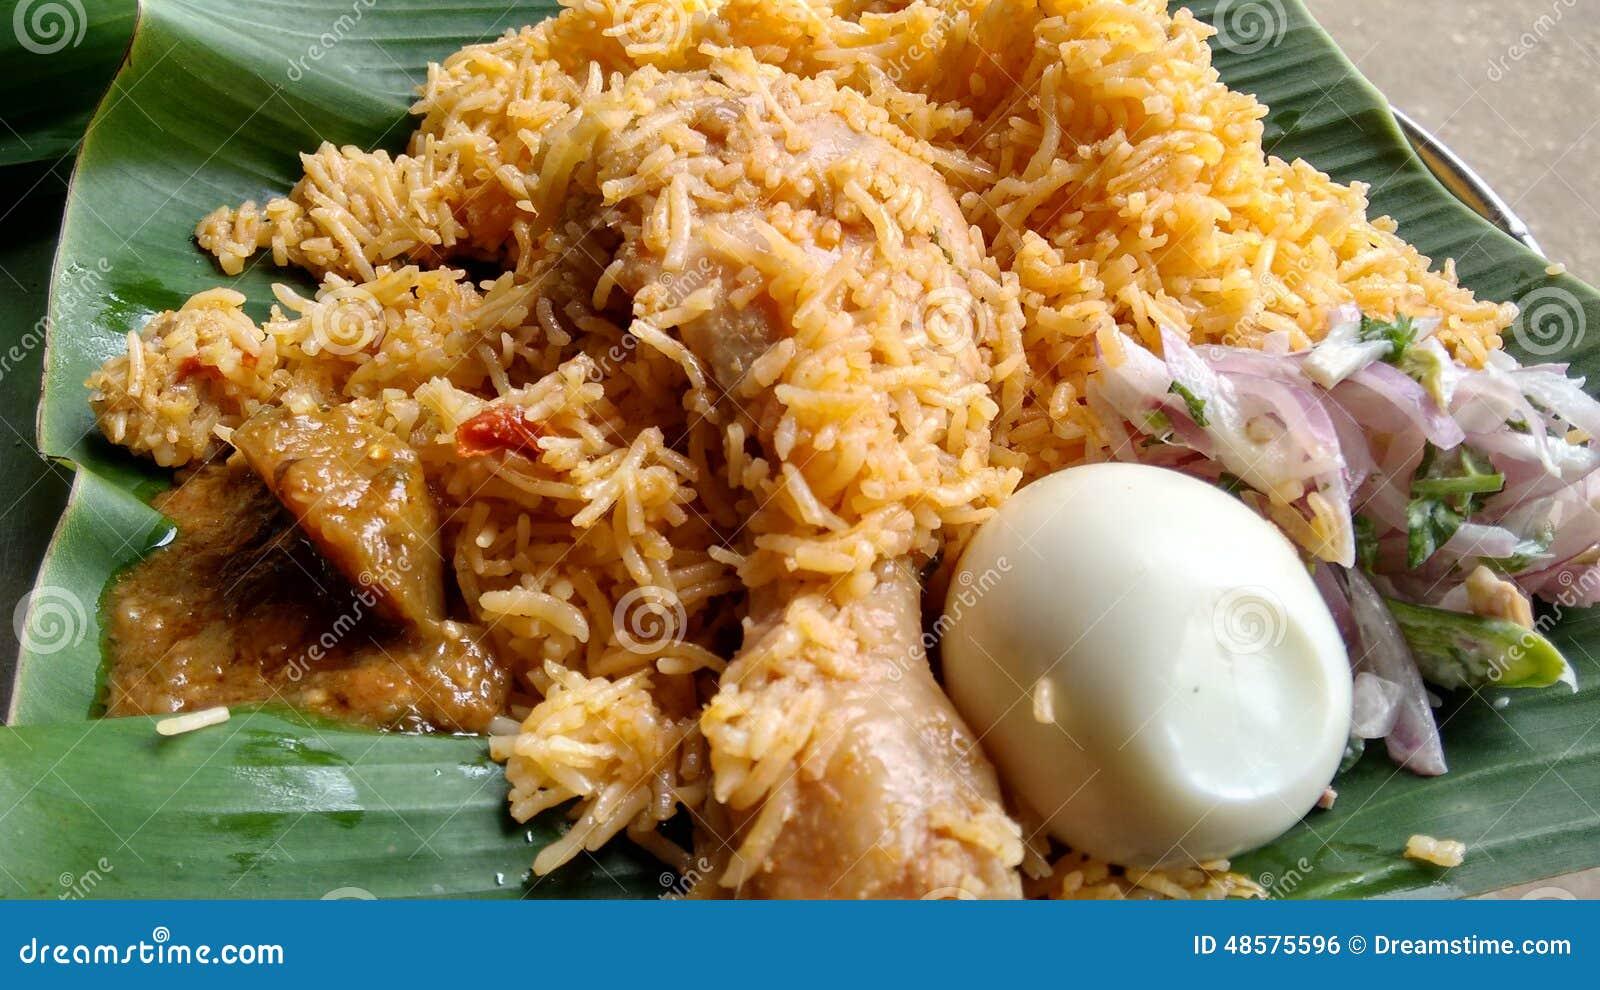 how to make chicken biryani in hindi video download